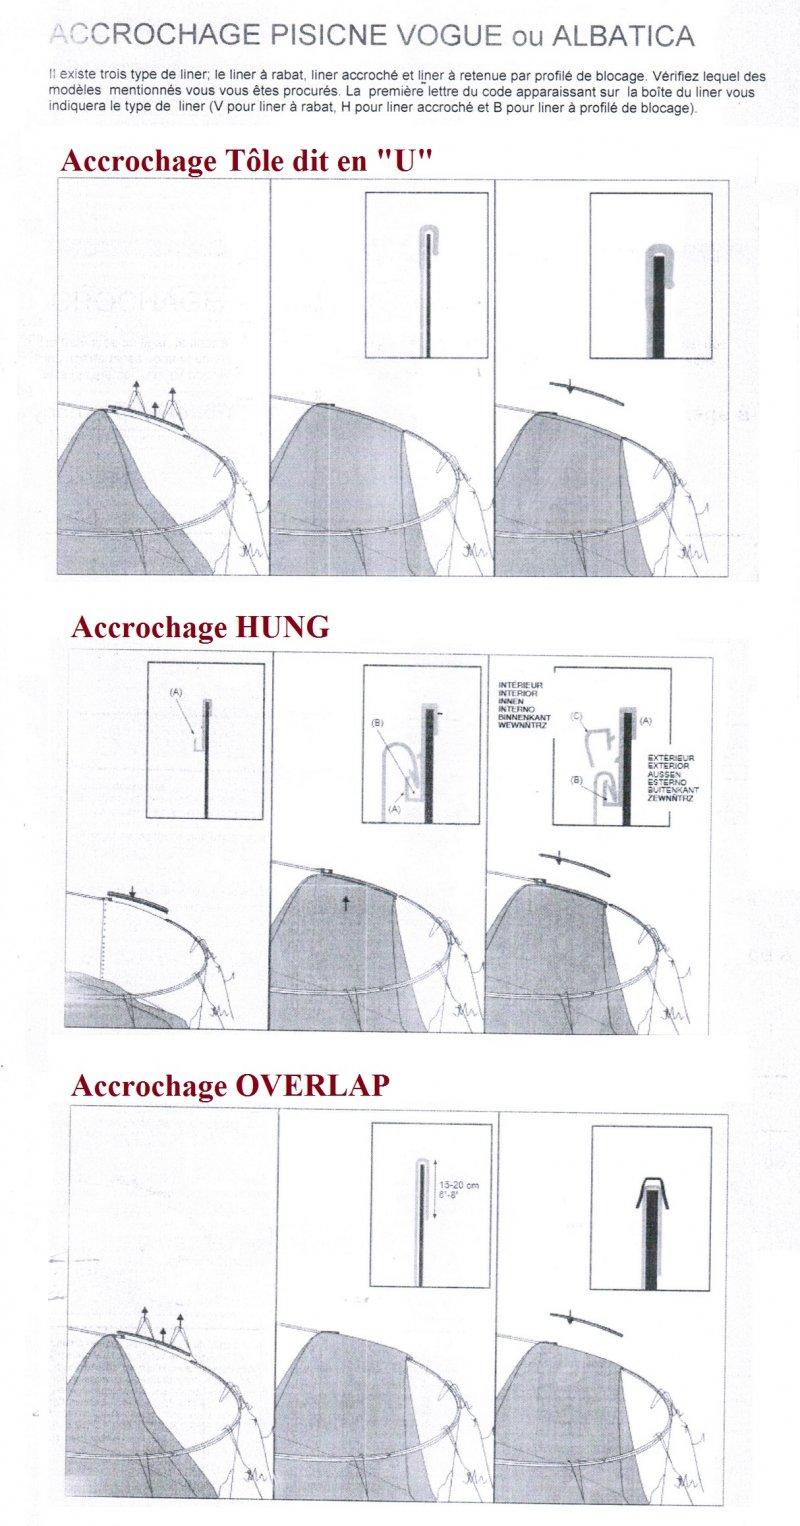 Albatica - Accrochages